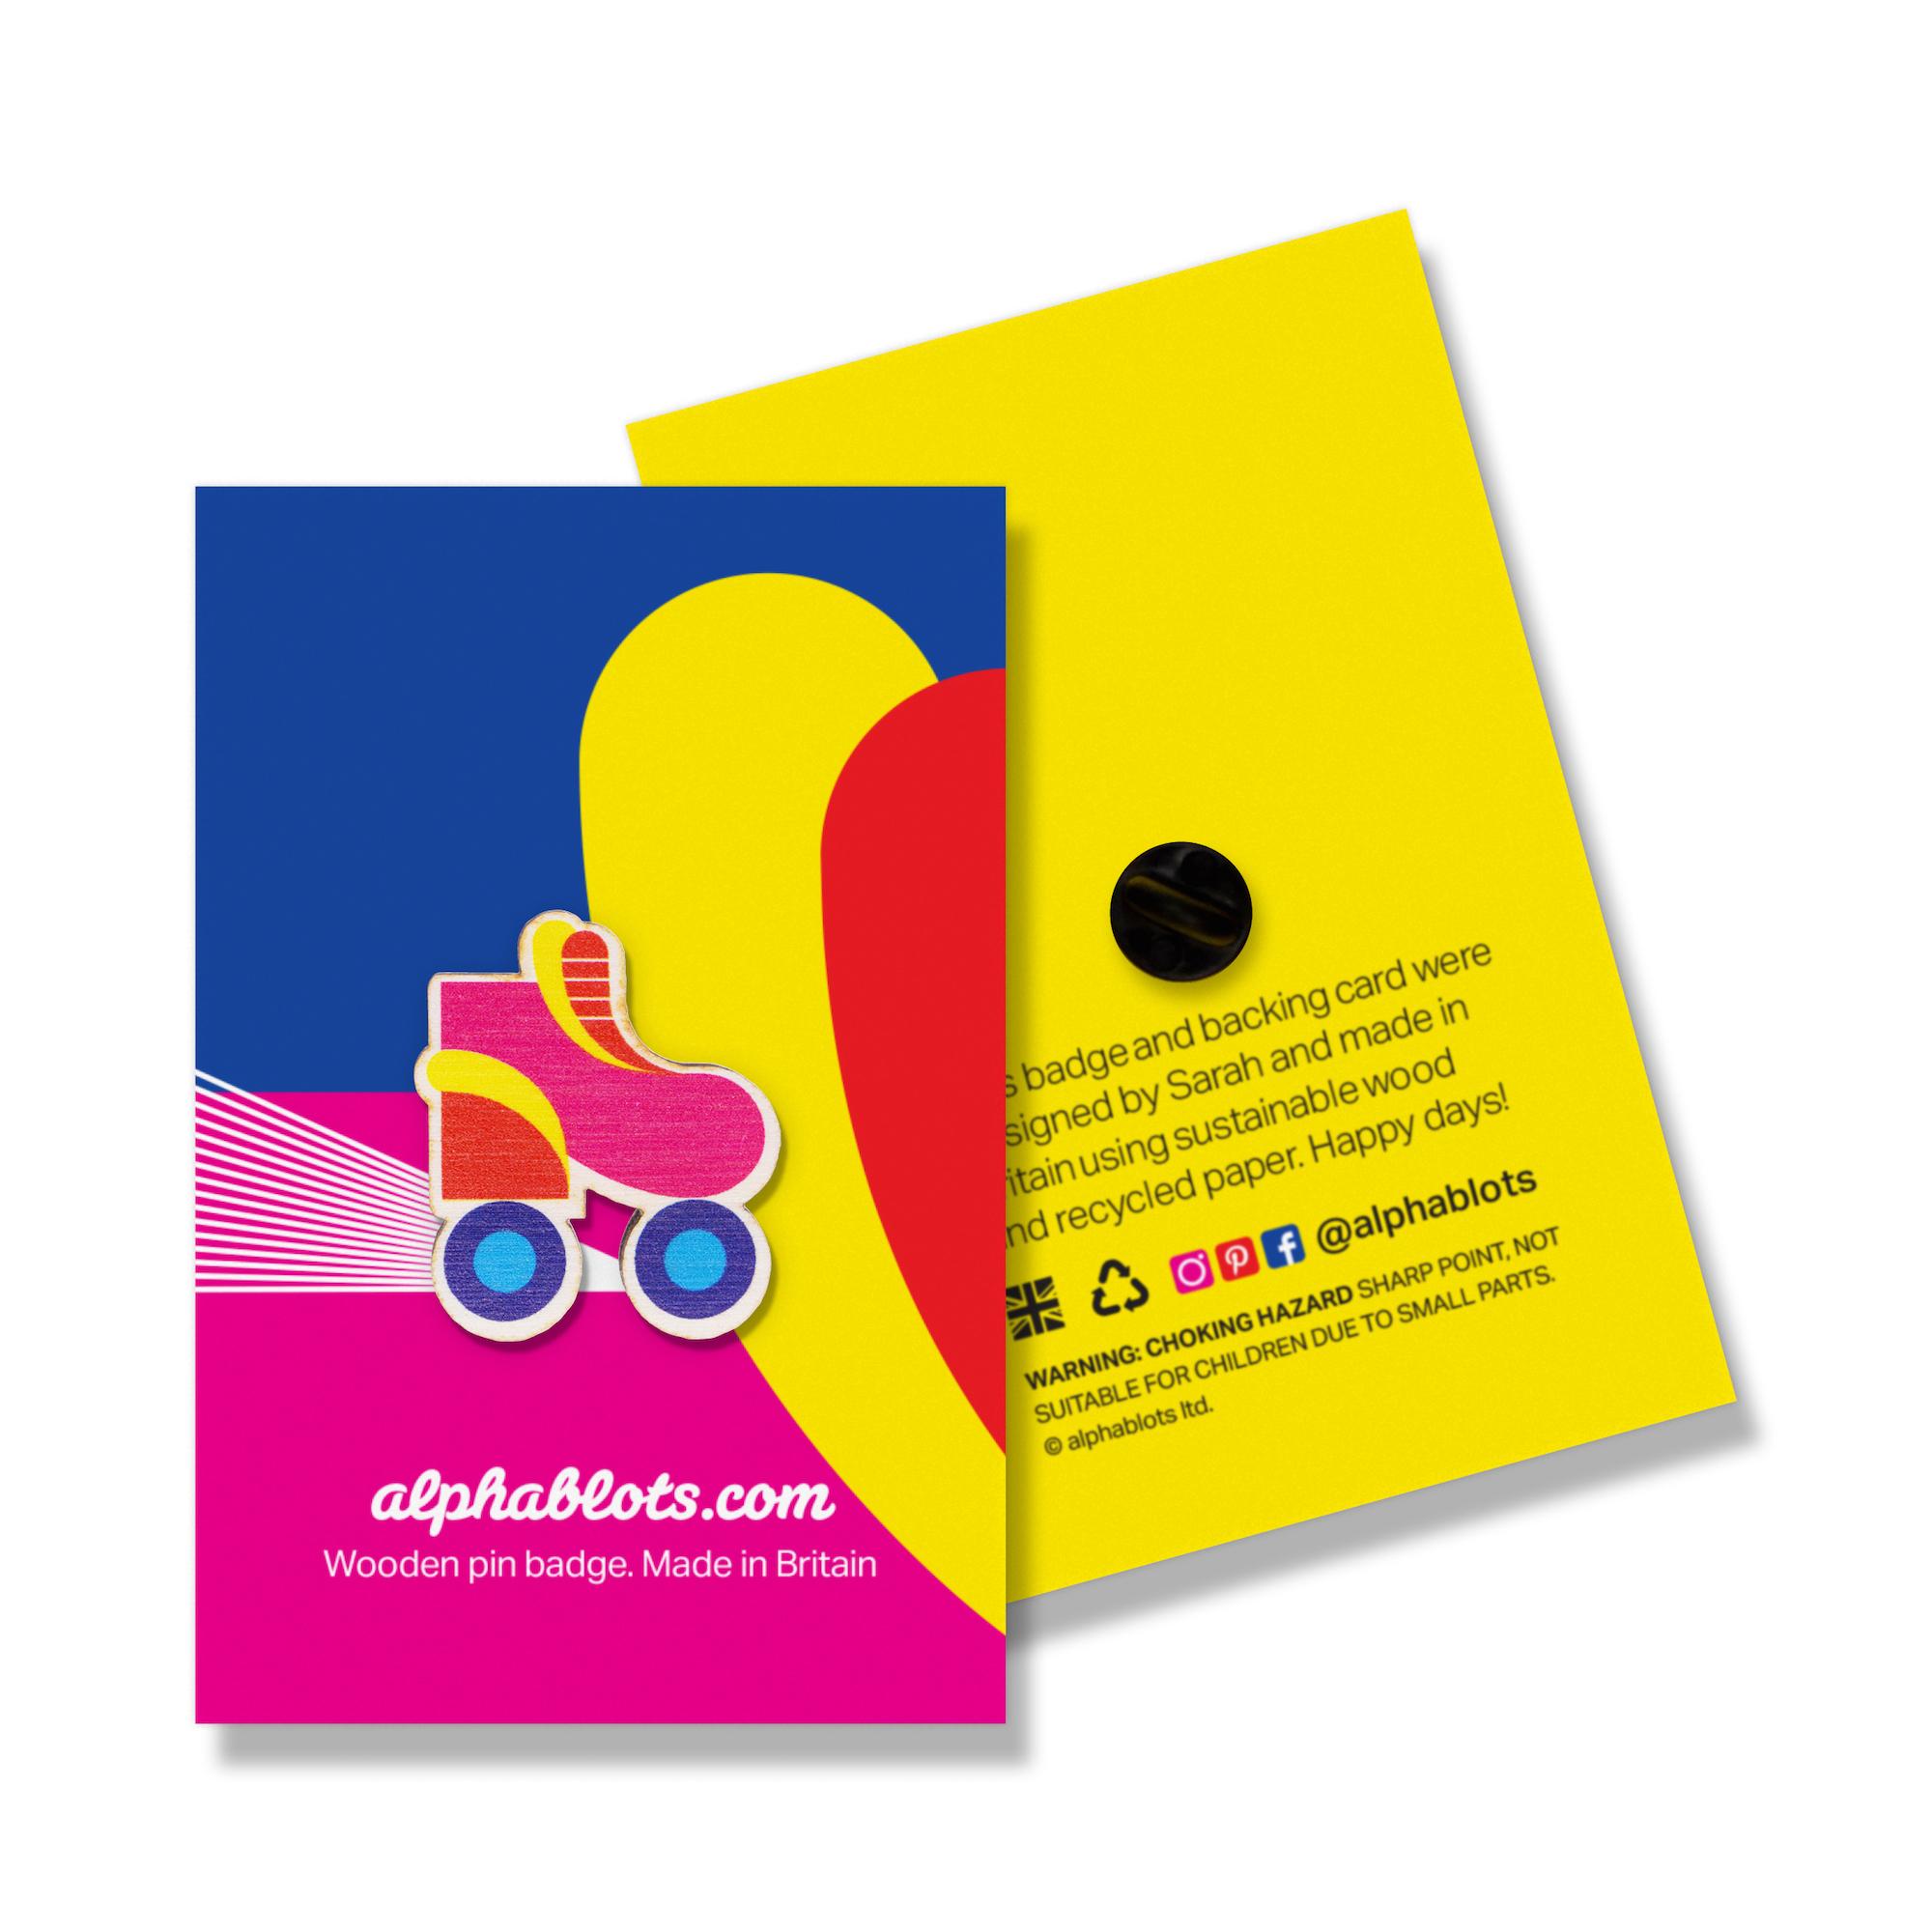 Rollerskate Pin Badge by Alphablots